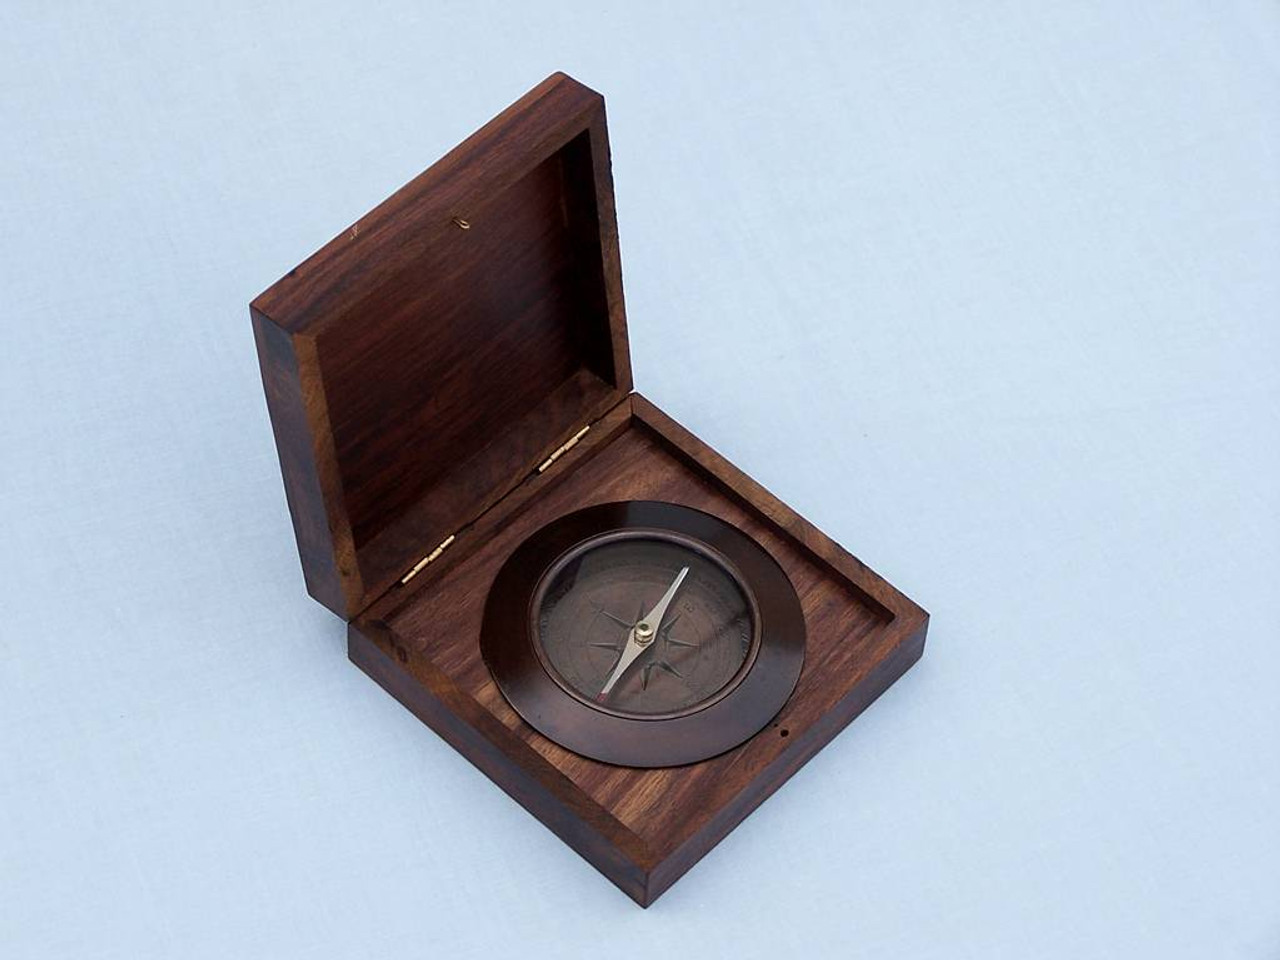 Admirals Compass Antique Copper Desktop Rosewood Case